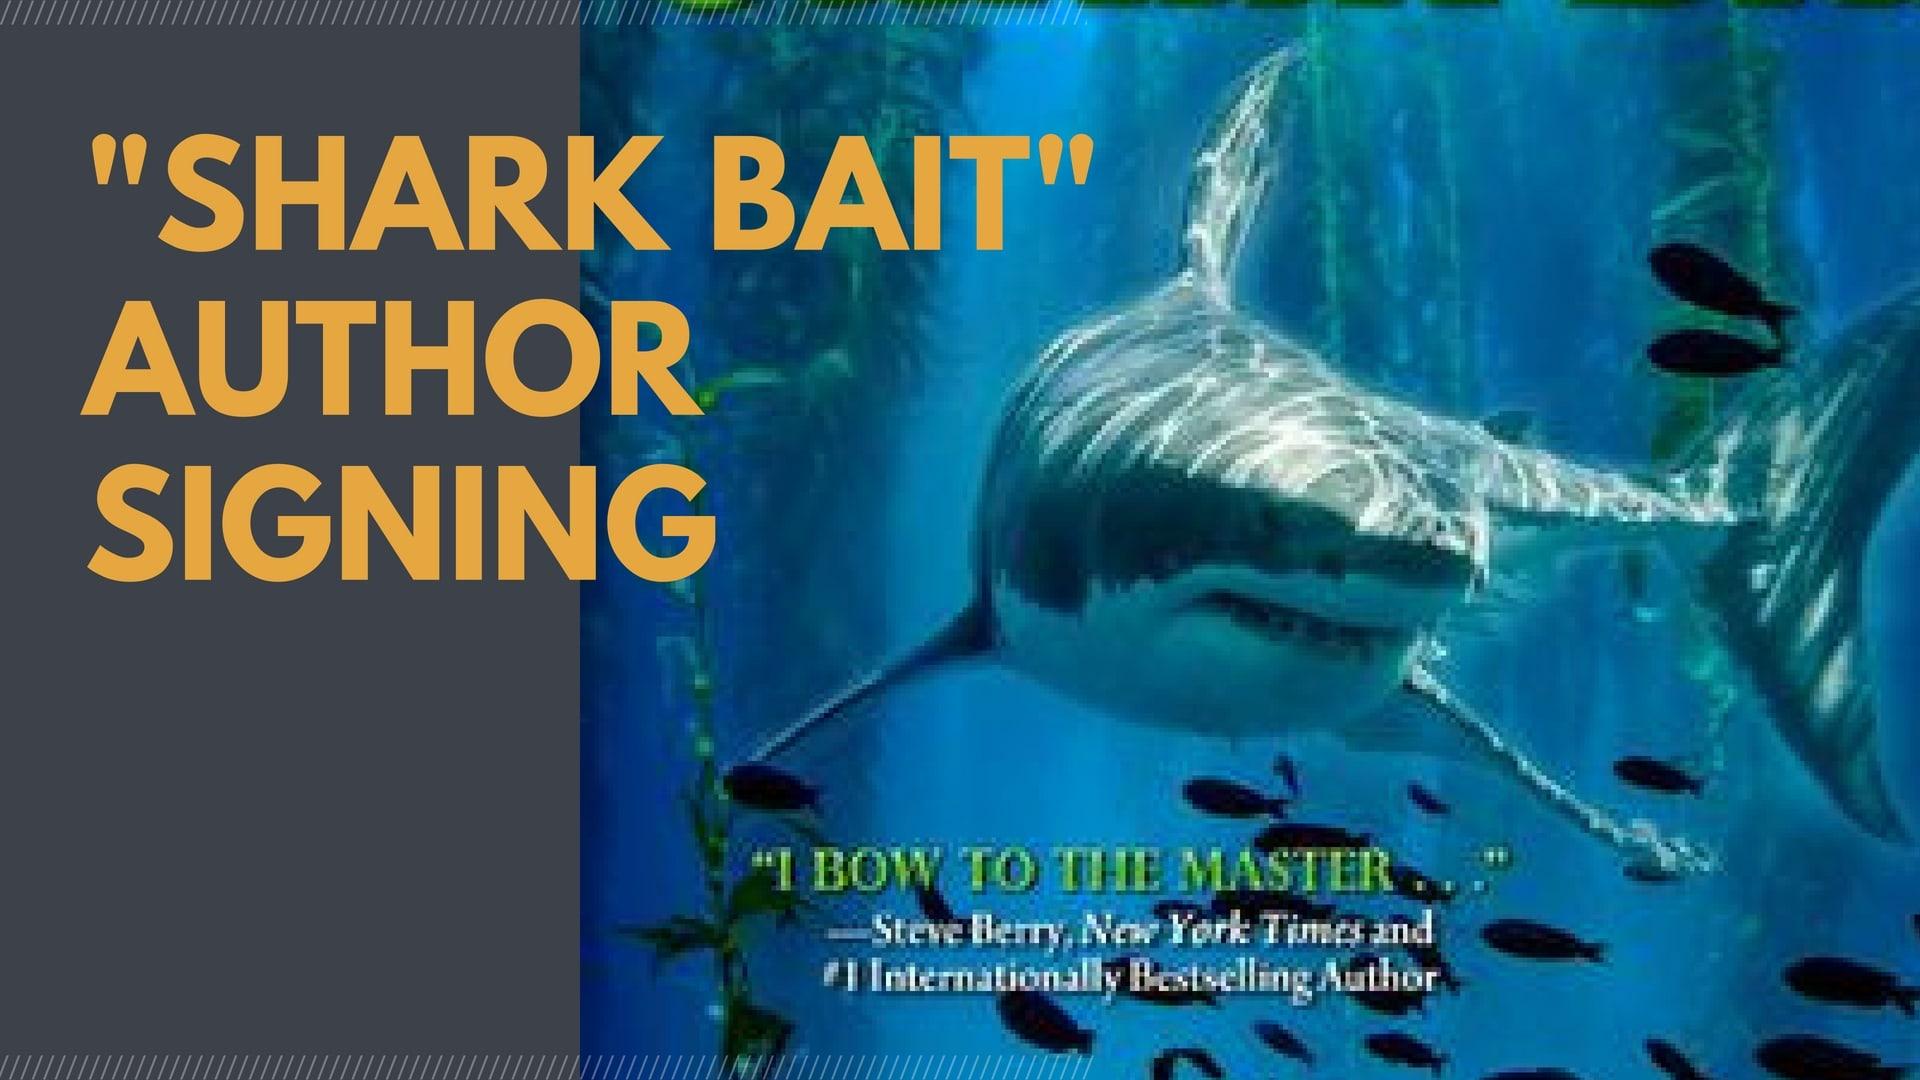 Cape Cod Beer Shark Bait Paul Kemprecos Atlantic White Shark Conservancy